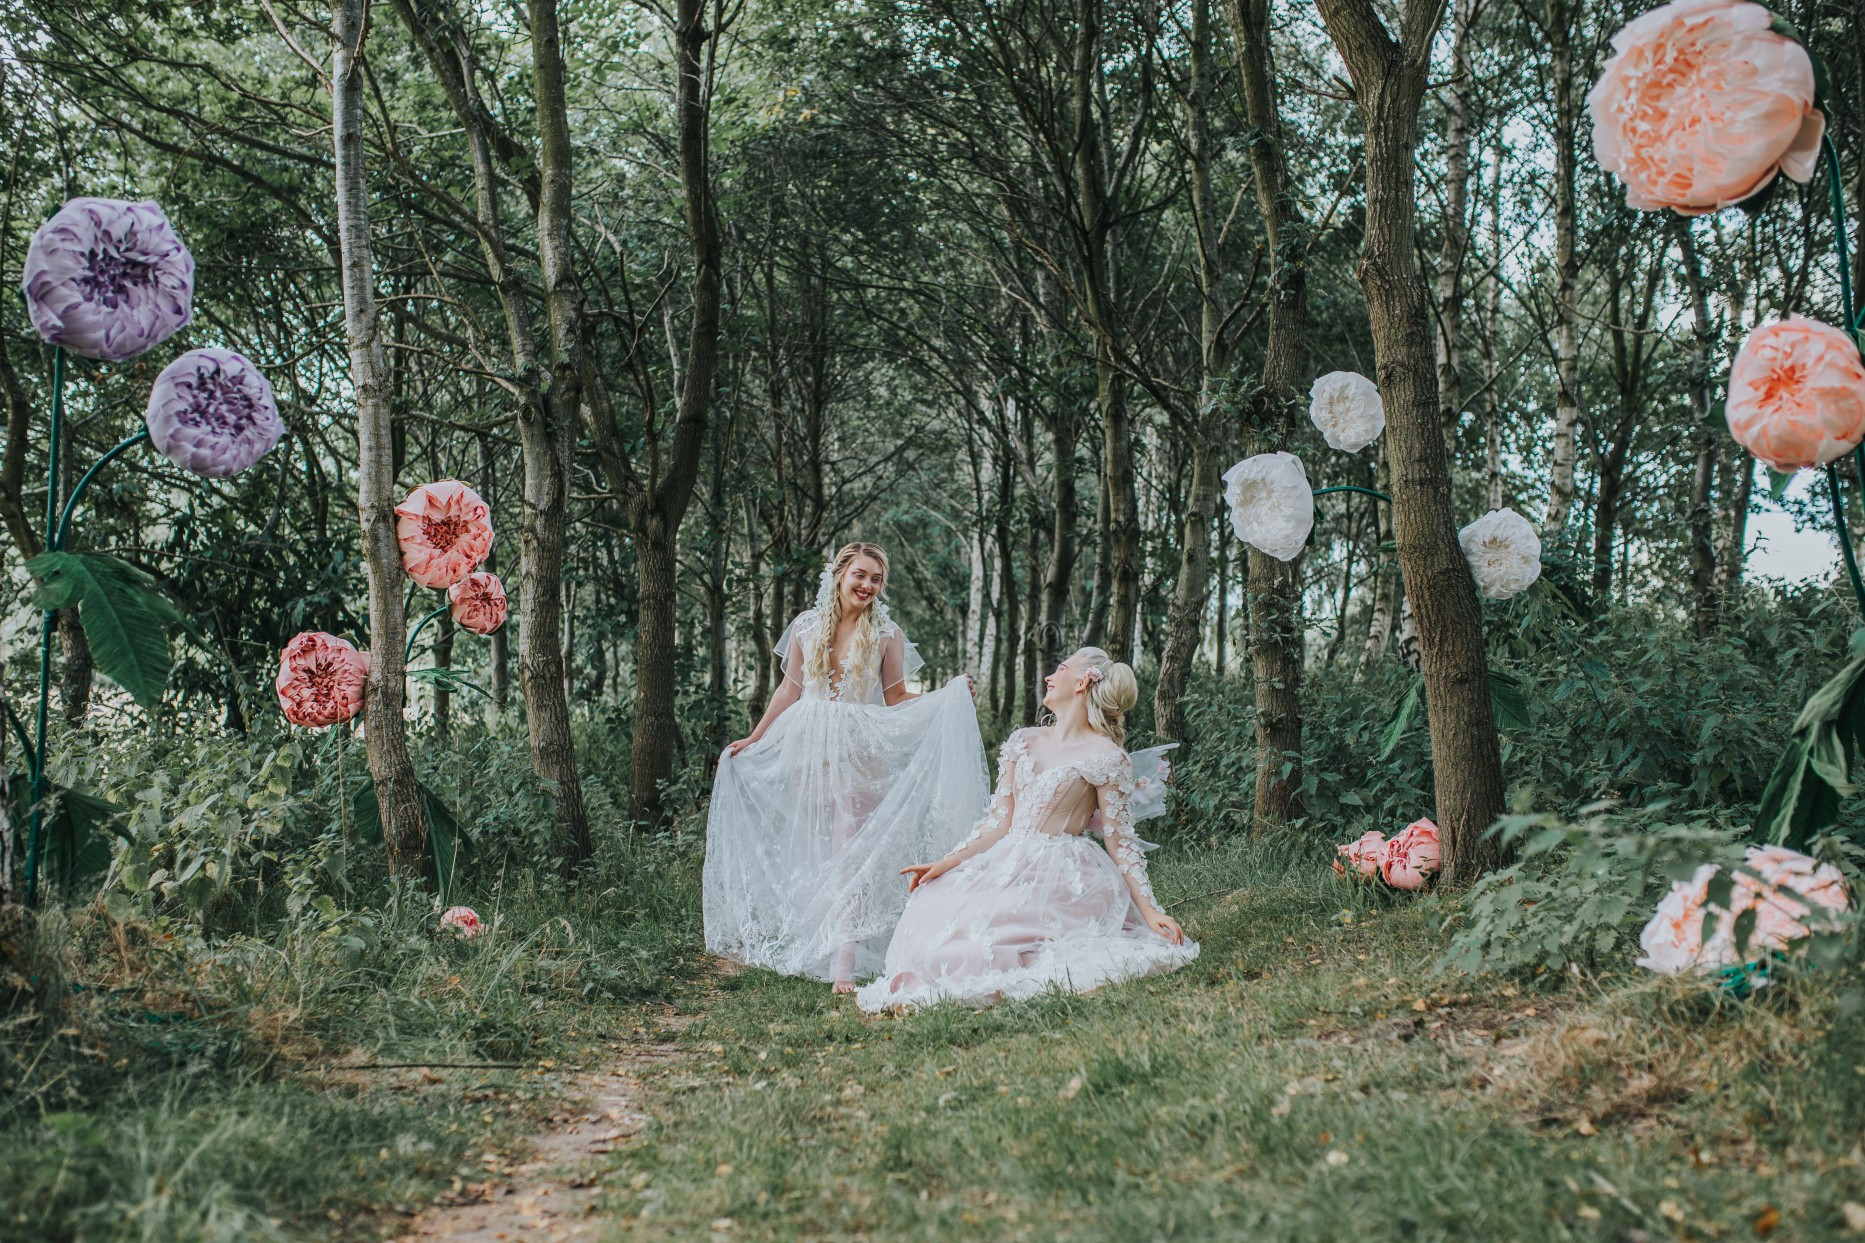 fairy wedding - whimsical wedding - magical wedding - elegant wedding dress - woodland wedding - woodland wedding decor -